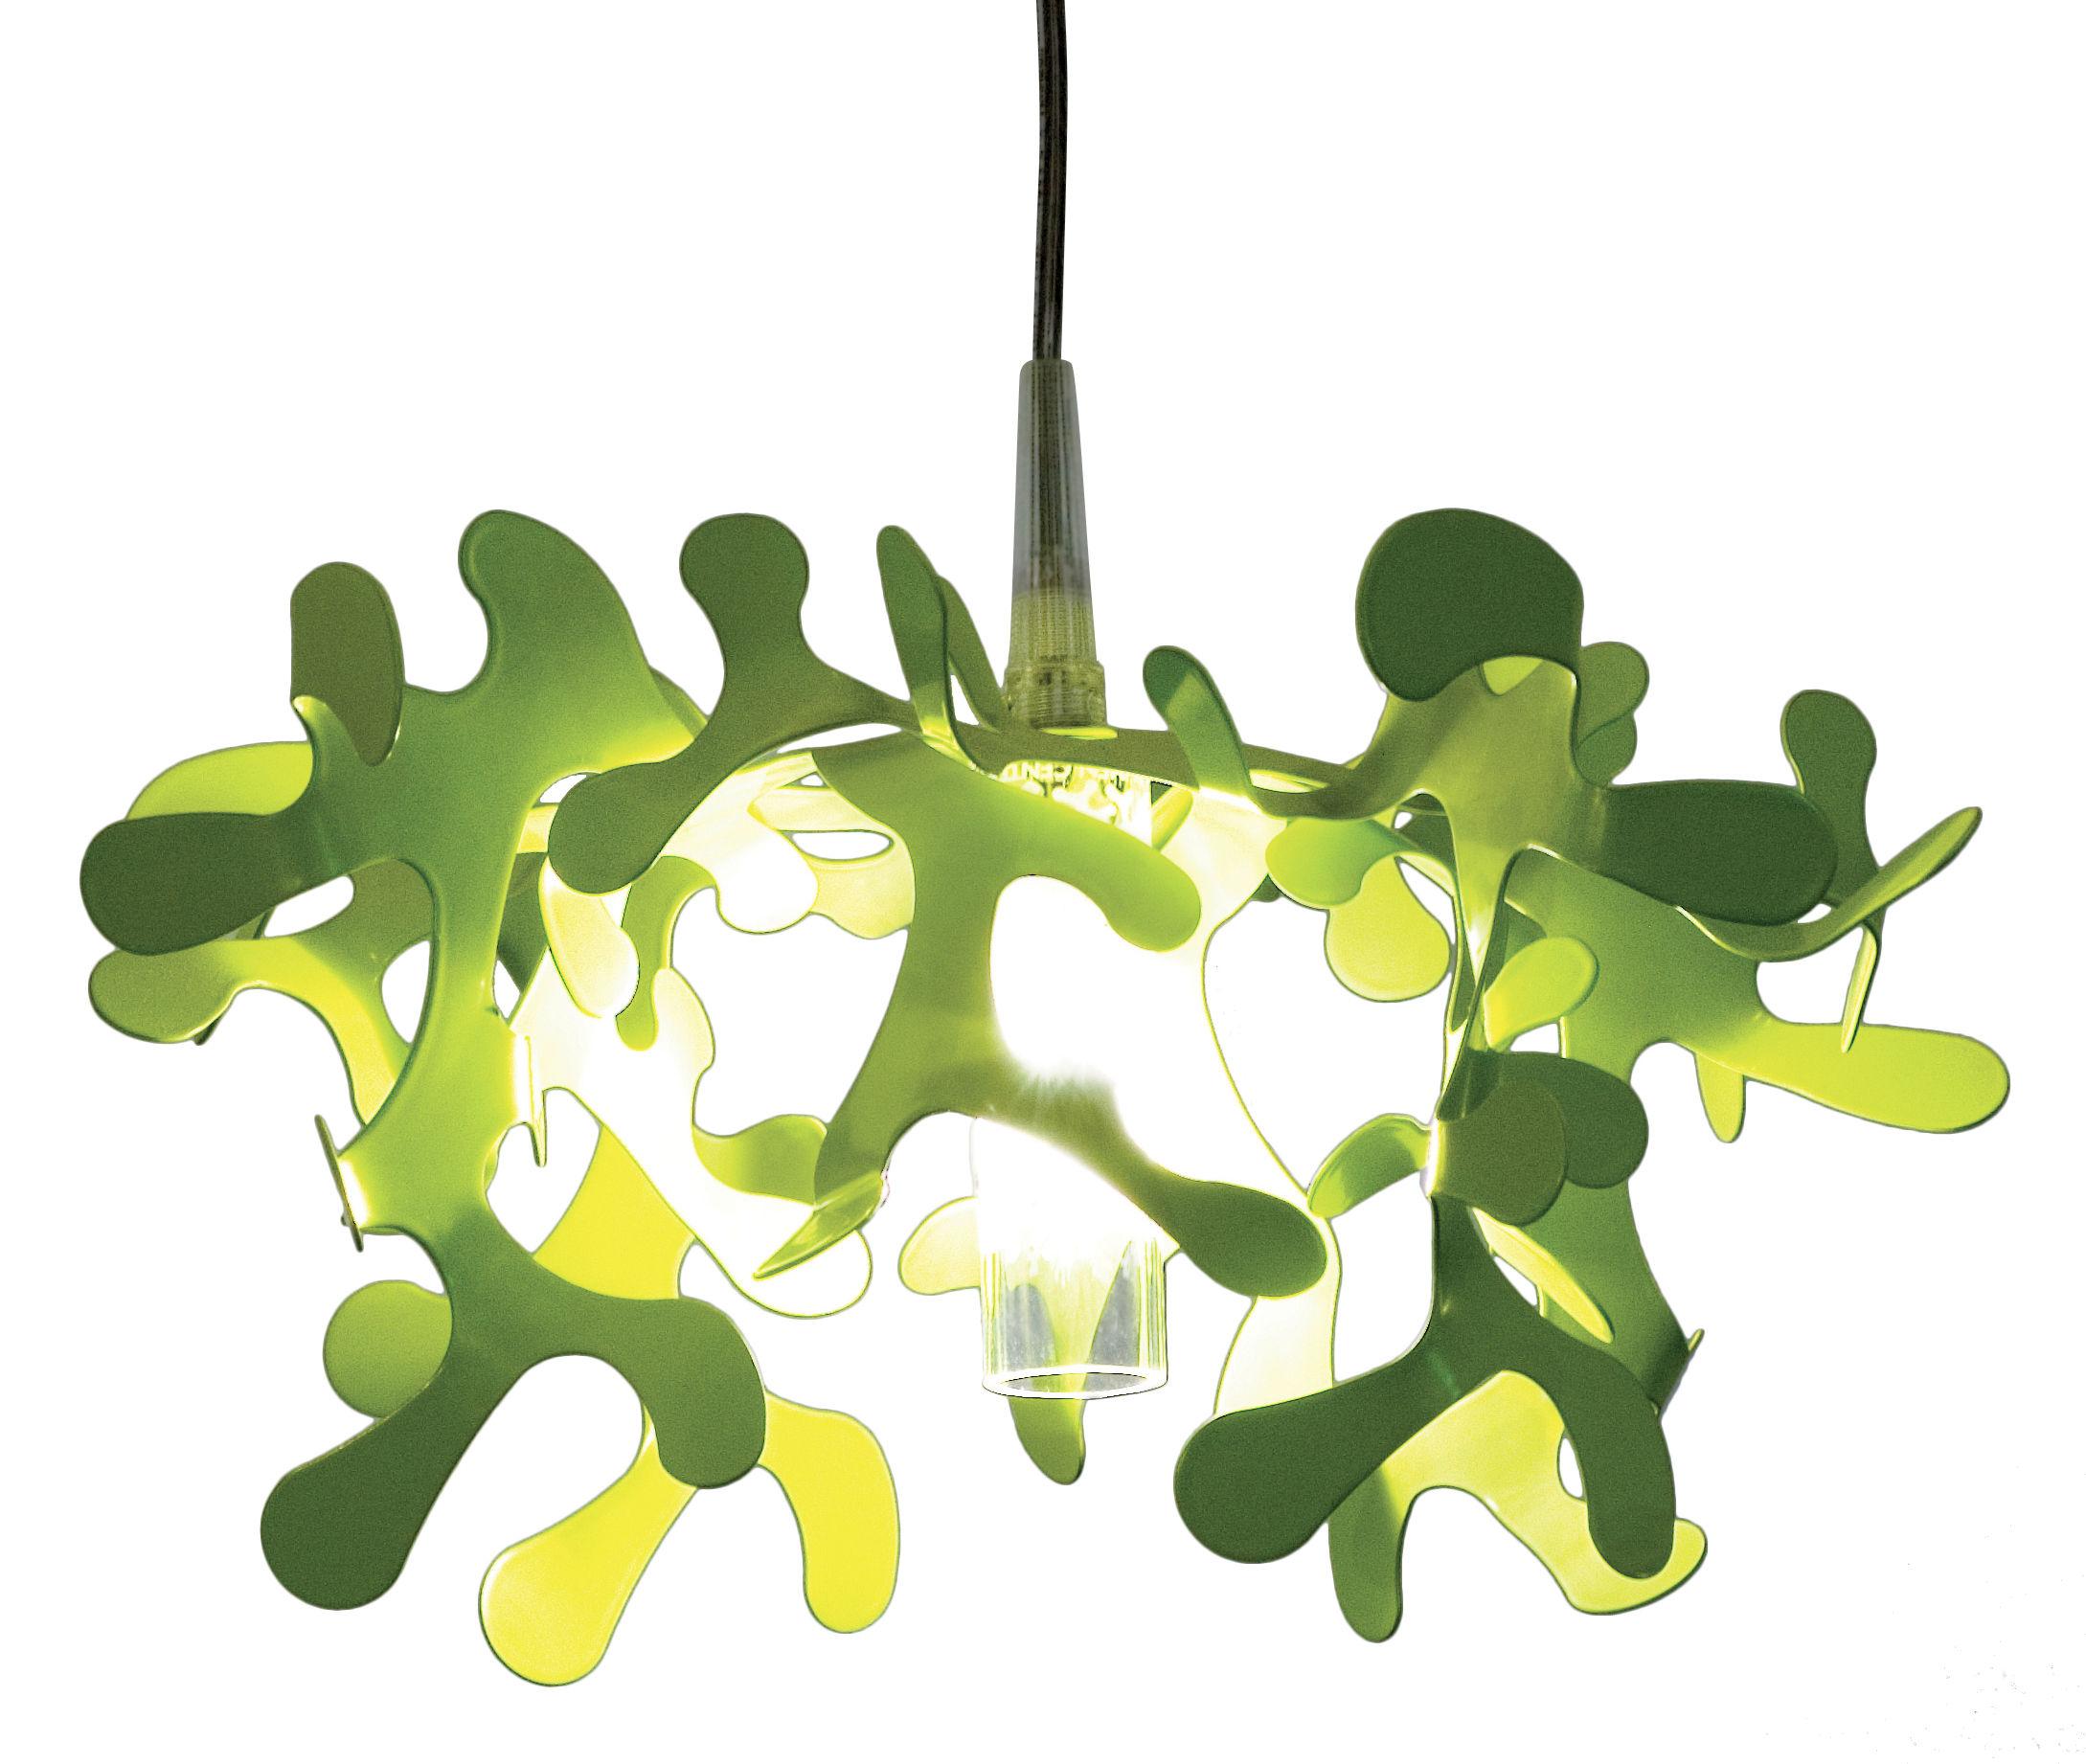 Lighting - Pendant Lighting - Mini Coral Pendant by Lumen Center Italia - Green - Lacquered metal